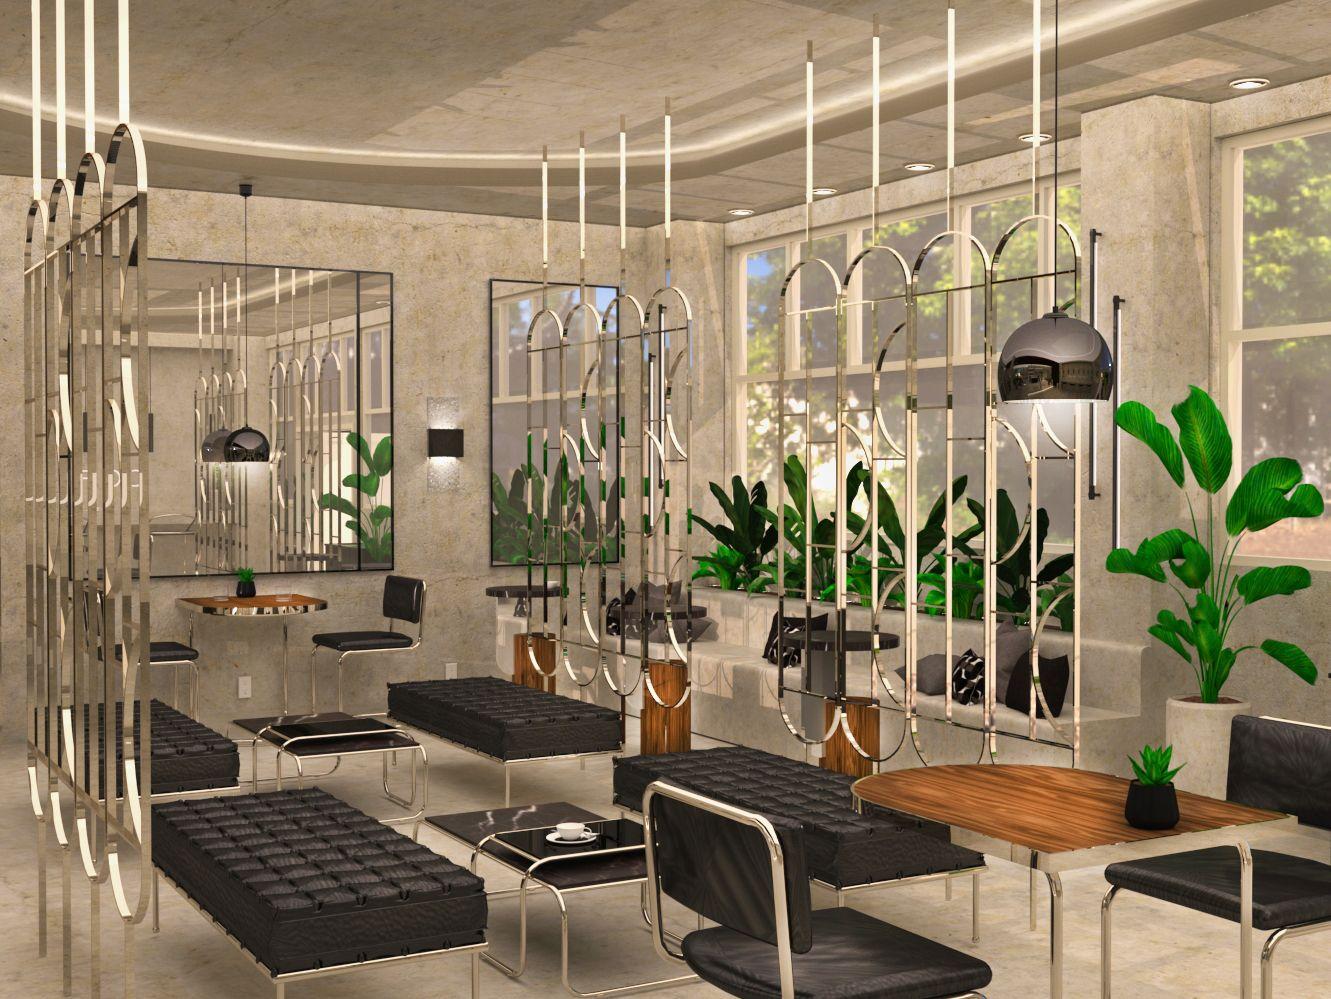 Coffee Haus Cafe - Lounge Area